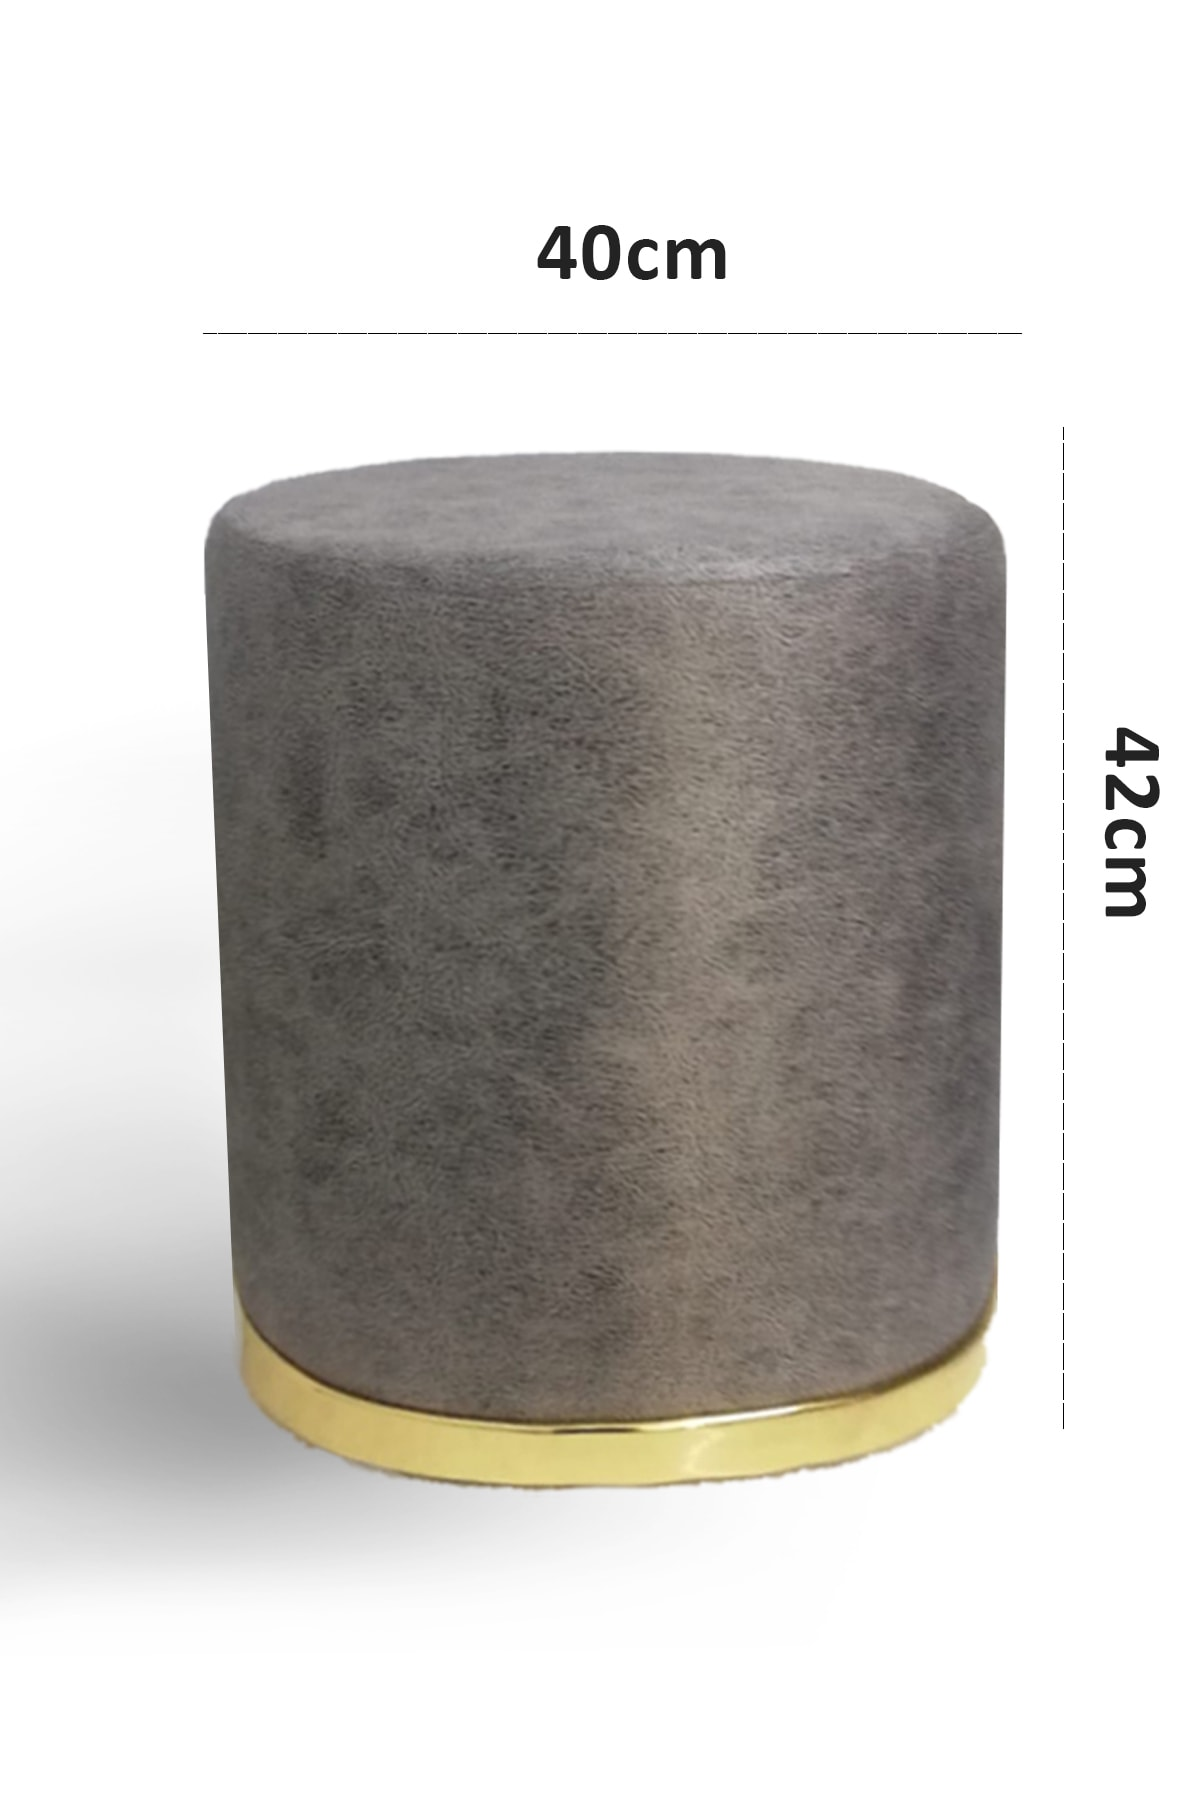 Zem Nora Silinebilir Puf - Grey Gold 2